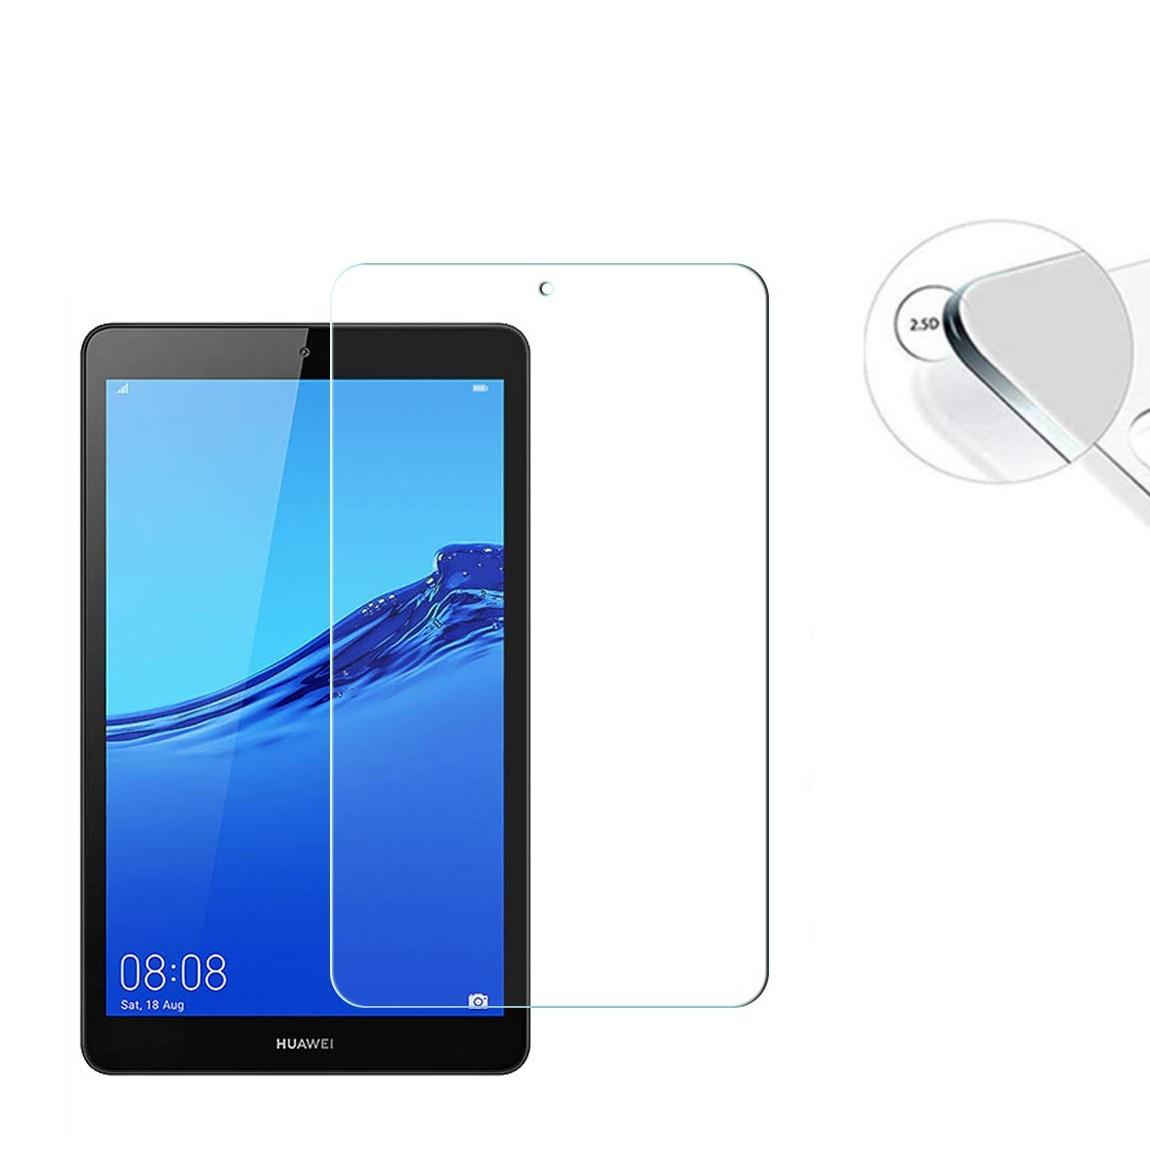 HUAWEI MediaPad M5 Lite 8.0 強化ガラスJDN2-L09 対応 送料無料 強化ガラス 液晶保護フィルム 撥油性 超安い 耐指紋 ガラスフィルム 業界最薄0.3mmのガラスを採用 ラウンドエッジ加工 2.5D 9H 表面硬度 『4年保証』 JDN2-L09